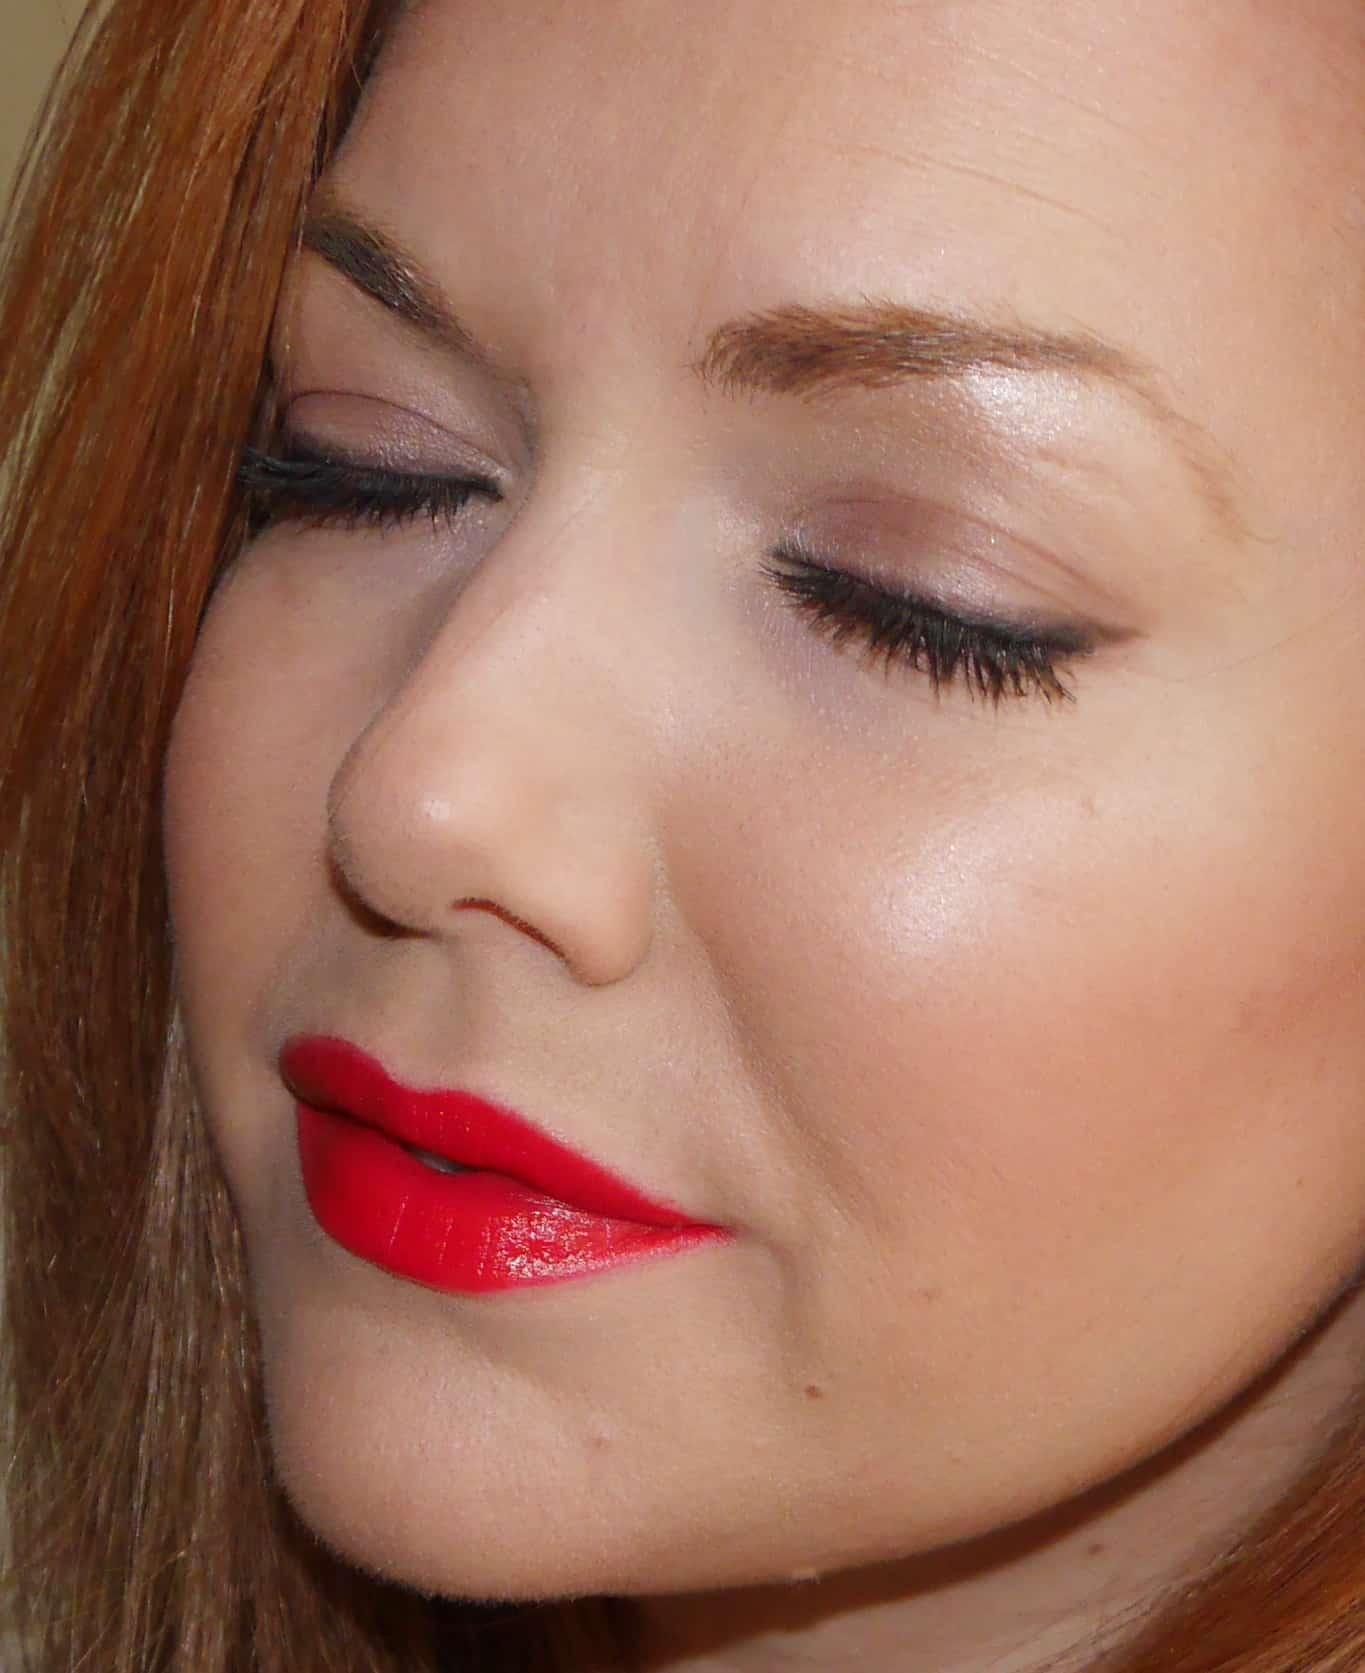 Makeup For Red Lipstick Days Girlgetglamorous